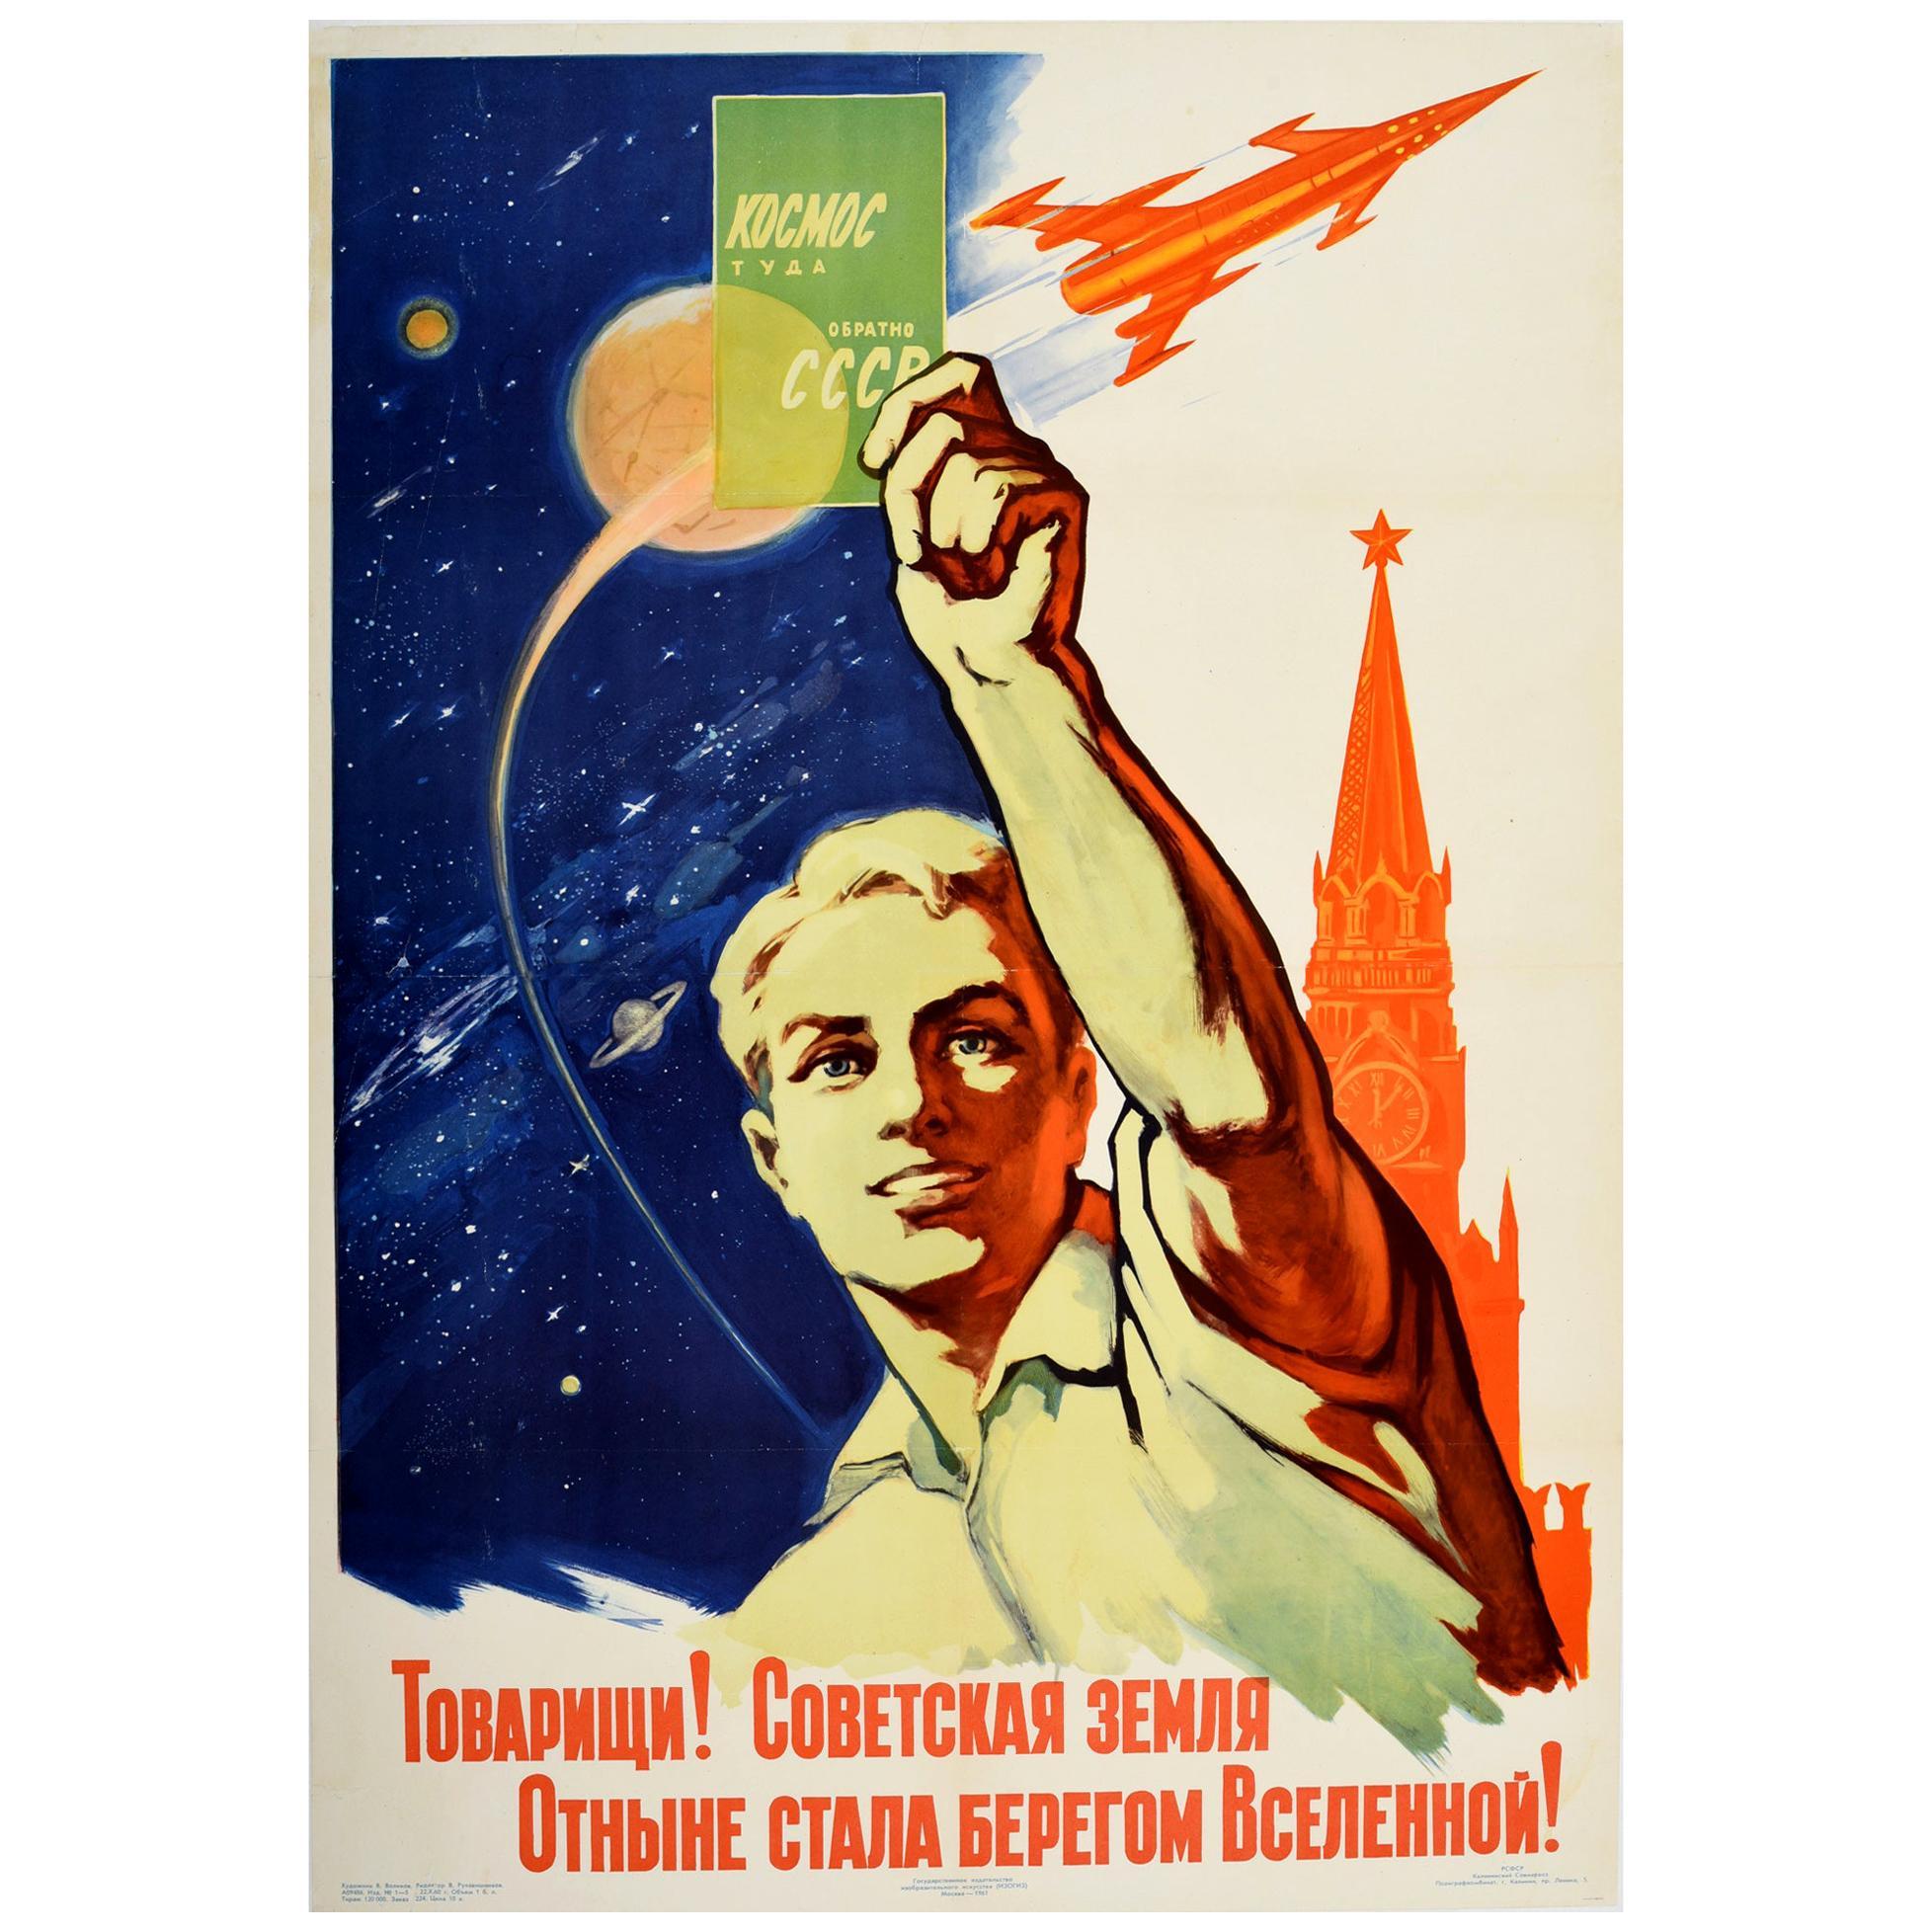 Original Vintage Poster Soviet Space Exploration Propaganda Rocket Travel Cosmos